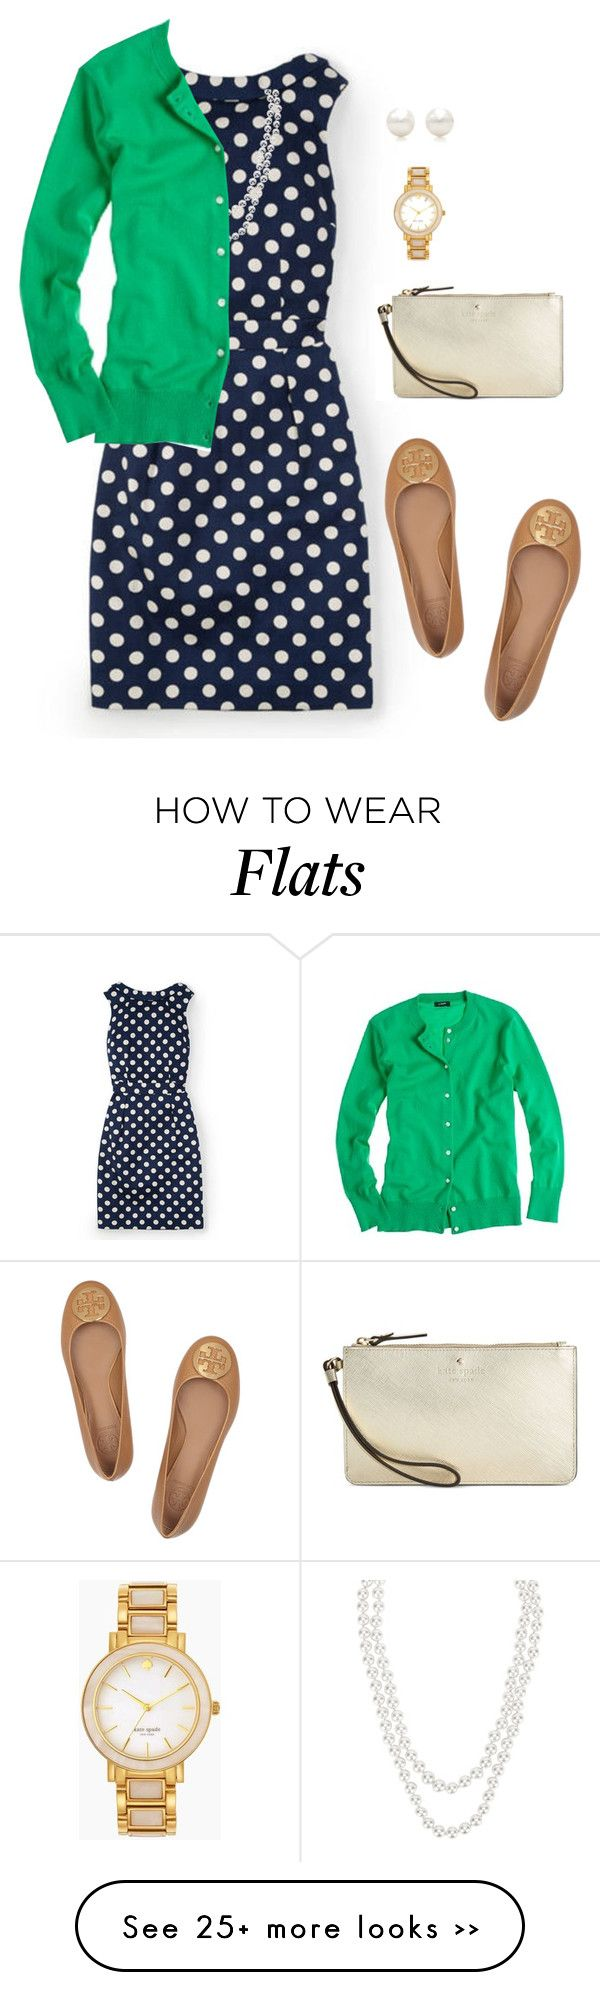 best 25 polka dot ideas on pinterest pink jeans